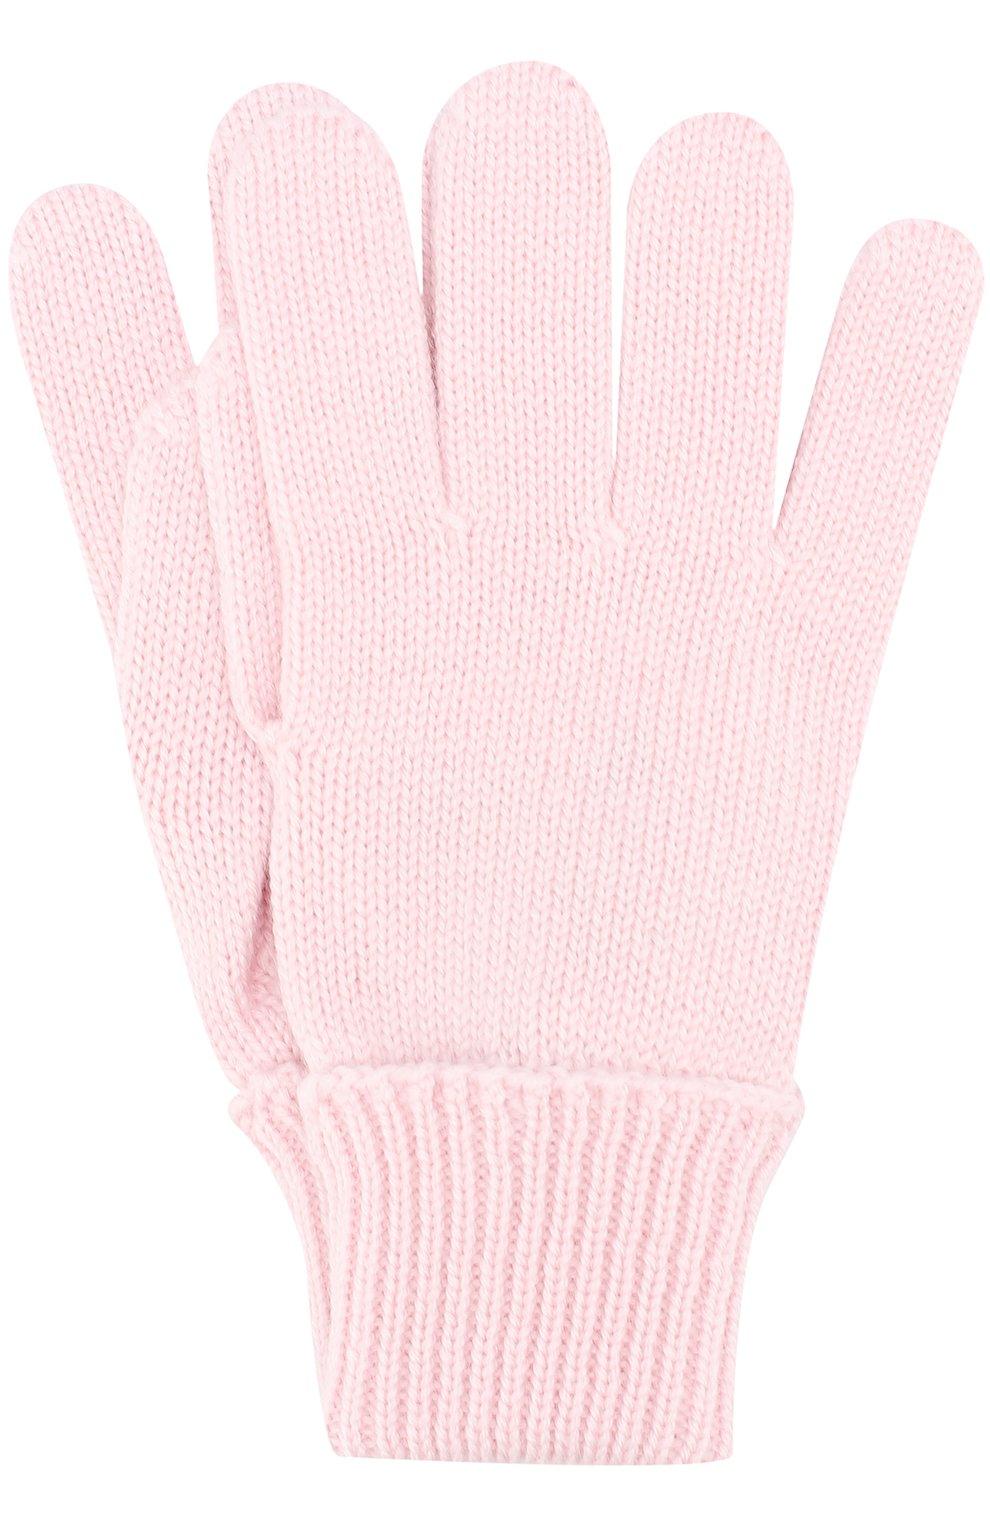 Детские шерстяные перчатки IL TRENINO светло-розового цвета, арт. 17 5059/E3 | Фото 1